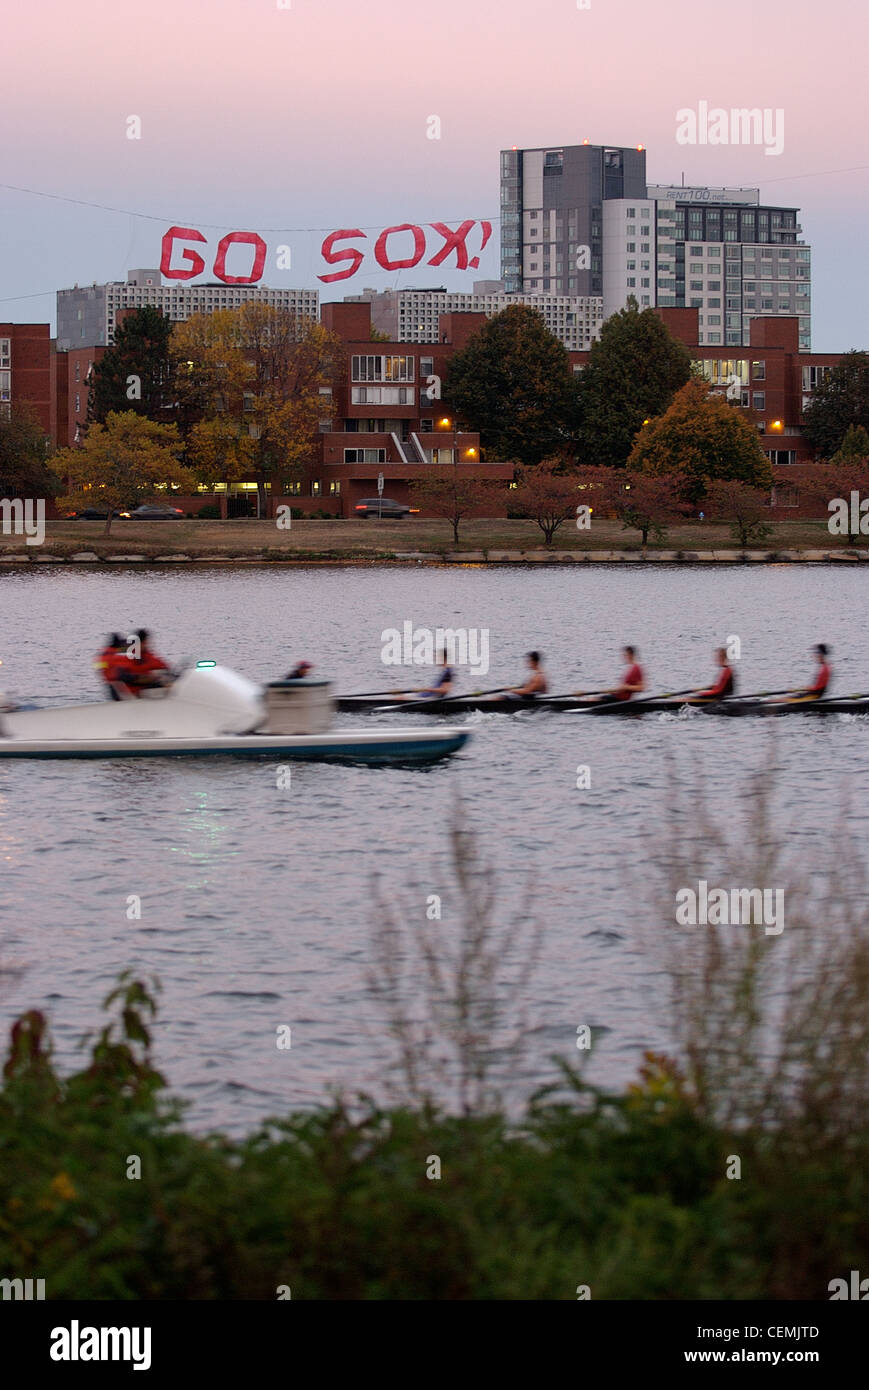 MIT go sox hacks rowers Feb 19 2012 massachusetts institute technology red sox boston cambridge - Stock Image